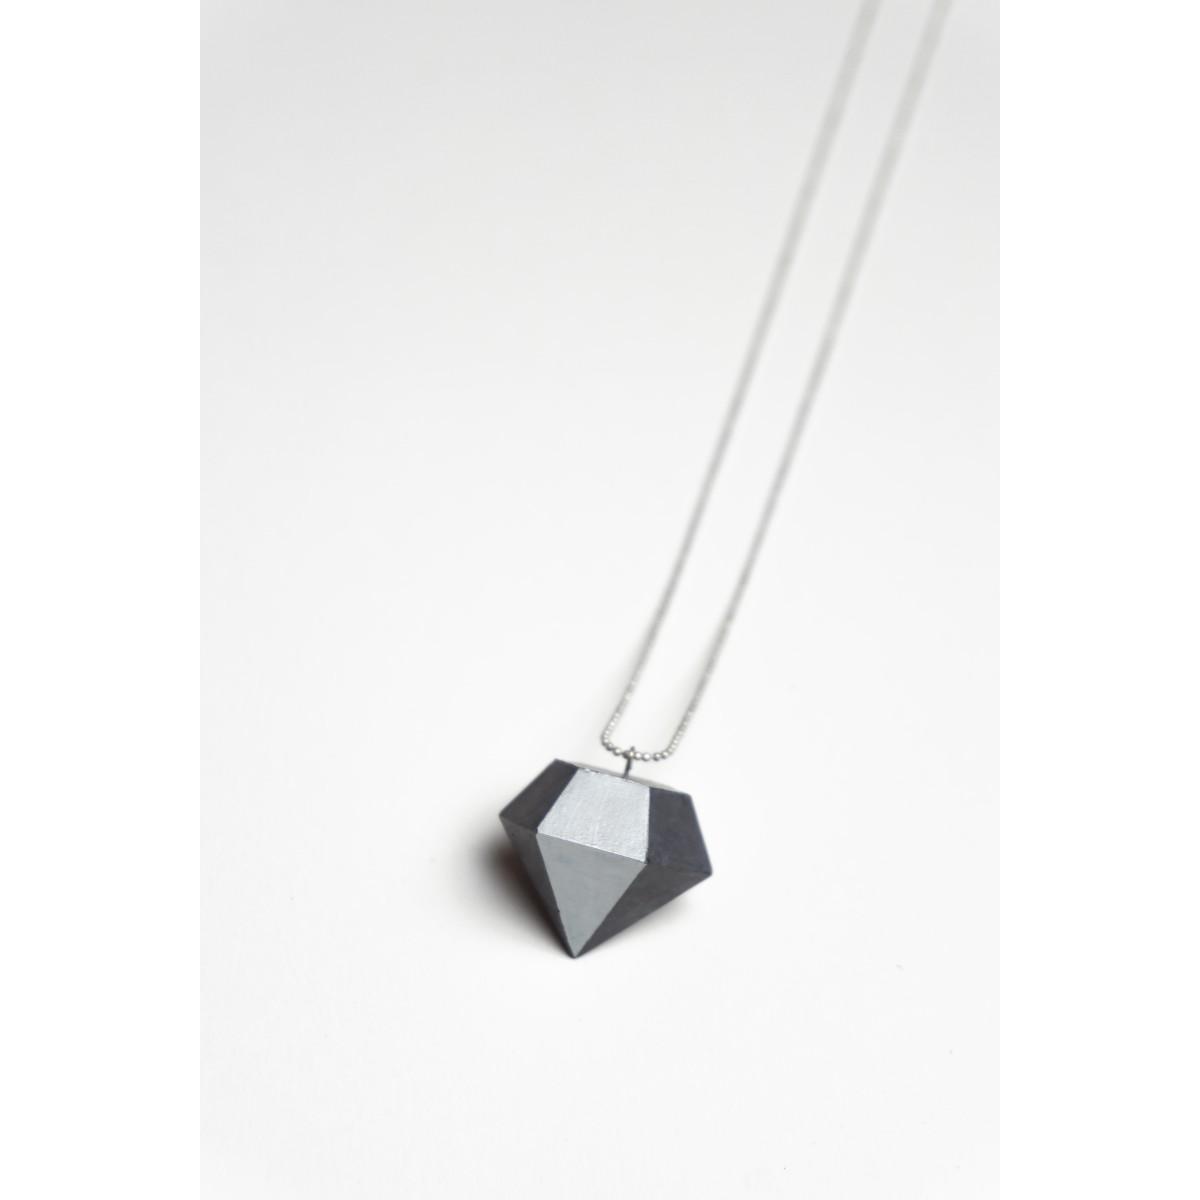 Klunkergrau | Dicker Klunker - Diamant aus Beton